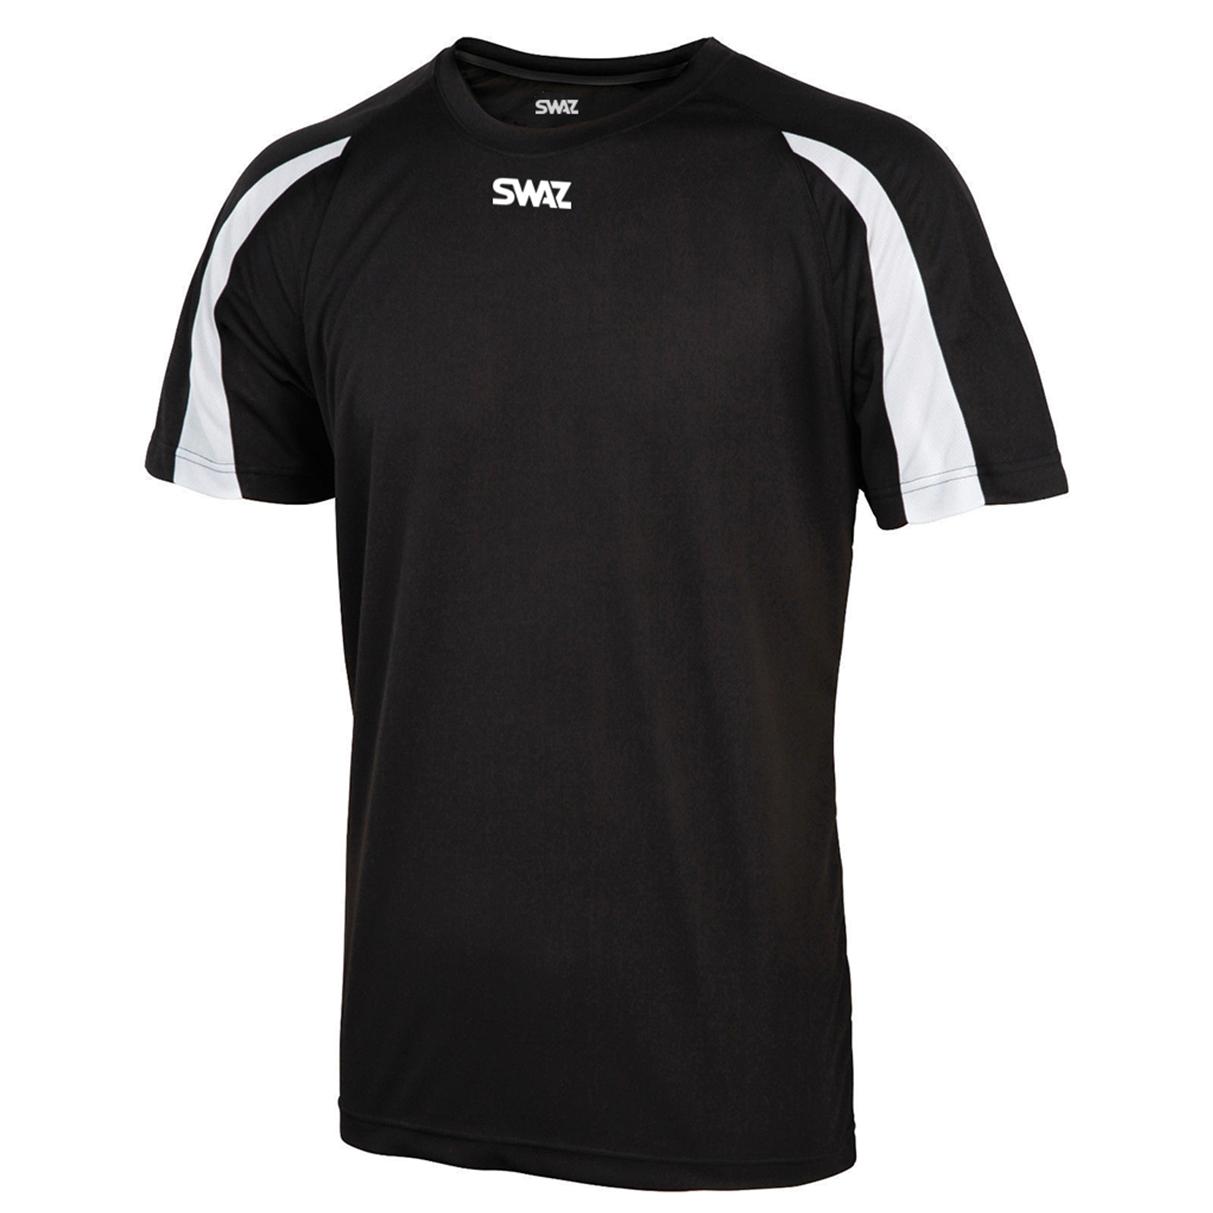 SWAZ Premier Training T-Shirt – Black/White